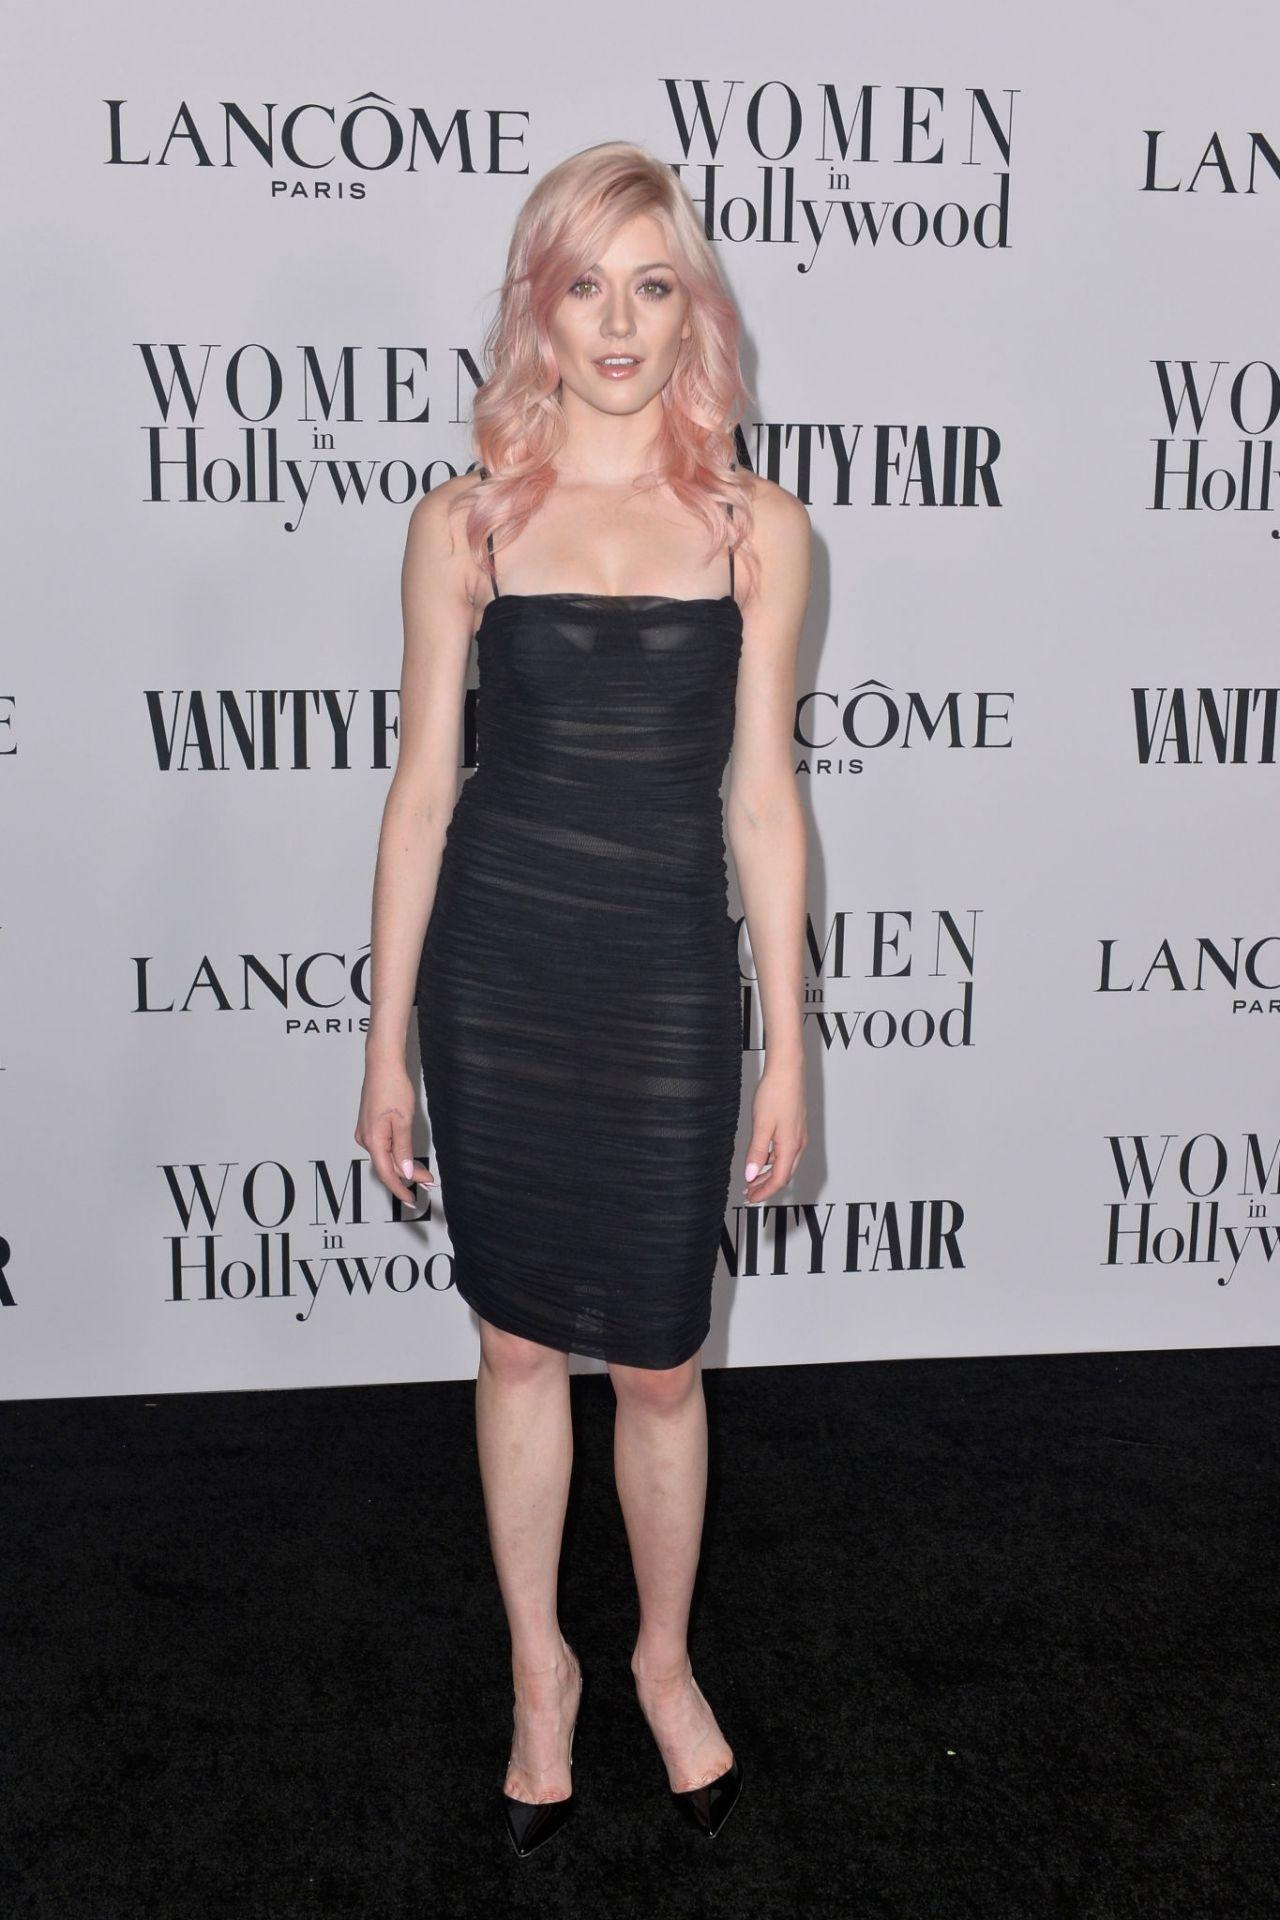 katherine-mcnamara-in-aritzia-vanity-fair-and-lancome-women-in-hollywood-celebration